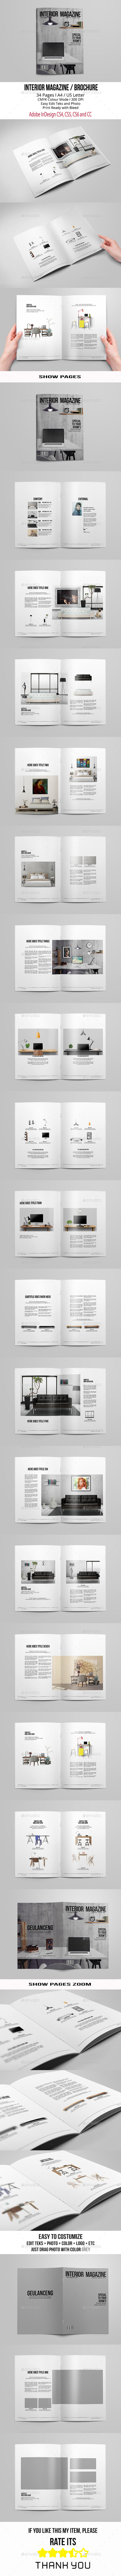 Interior Magazine A4/US Letter - Magazines Print Templates